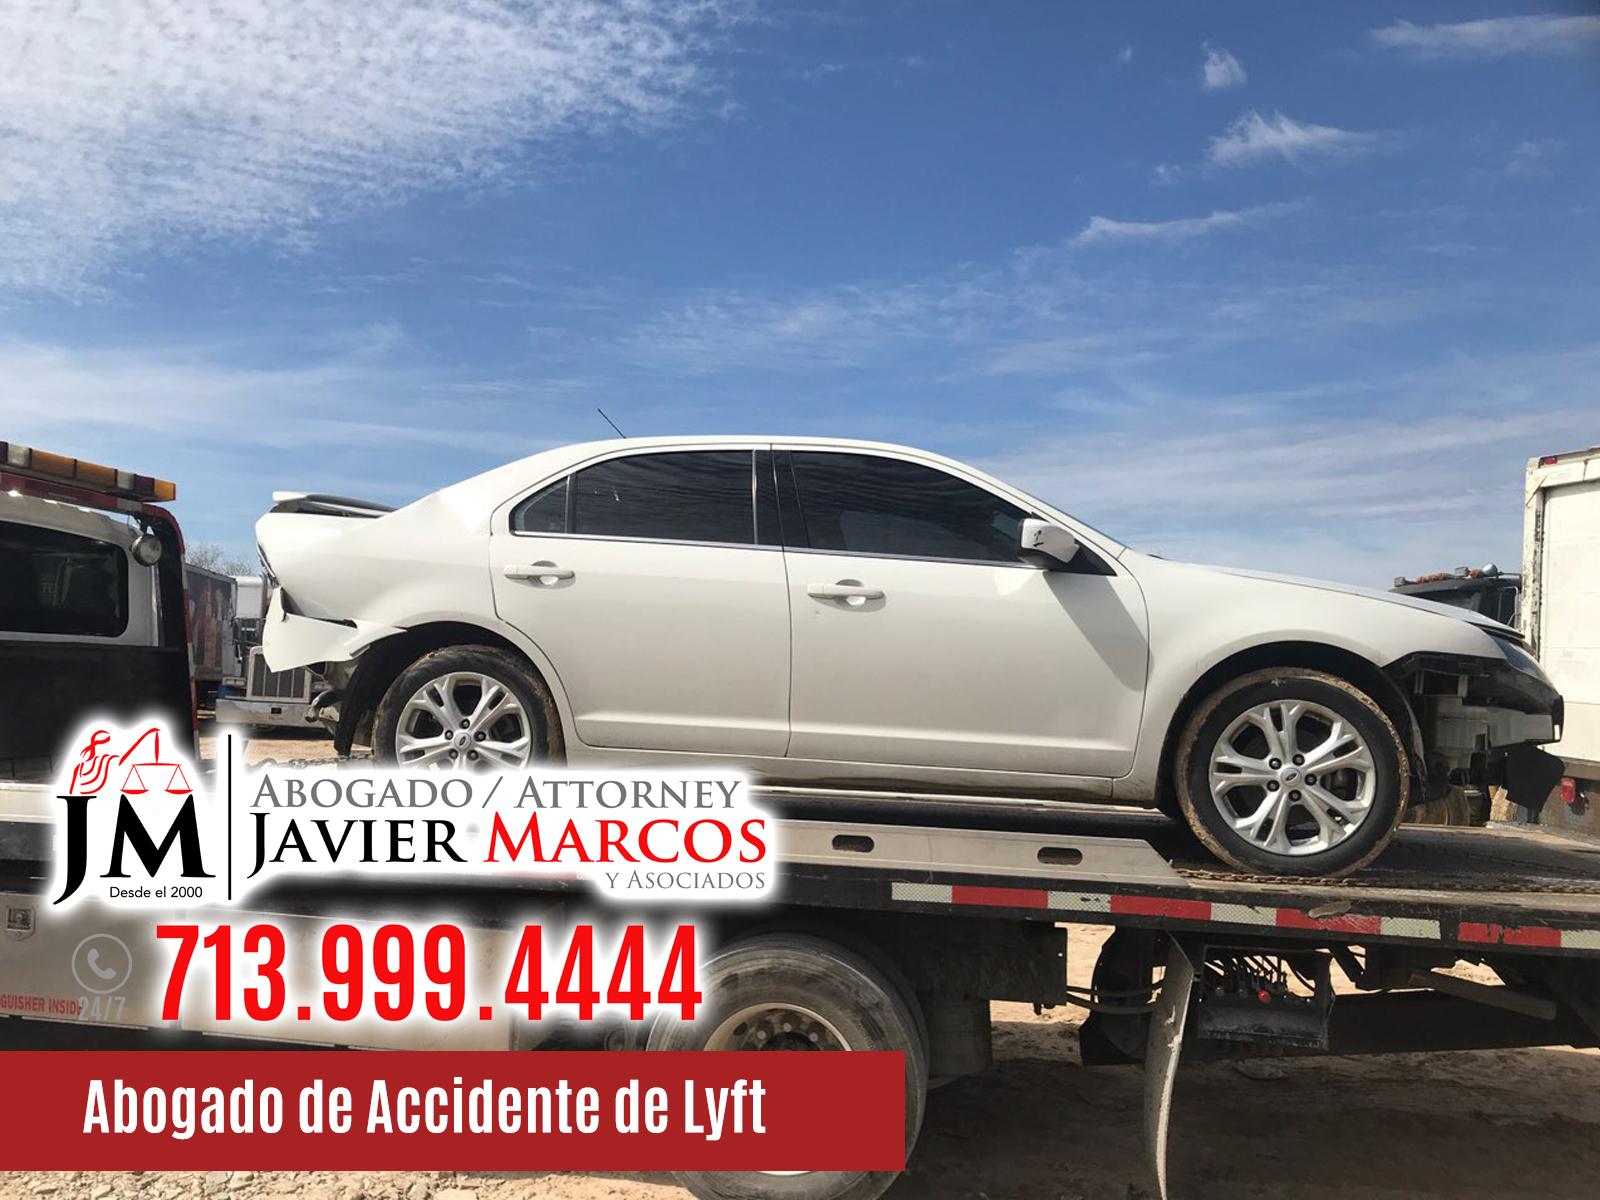 Abogado de Accidente de Lyft | Abogado Javier Marcos | 713.999.4444